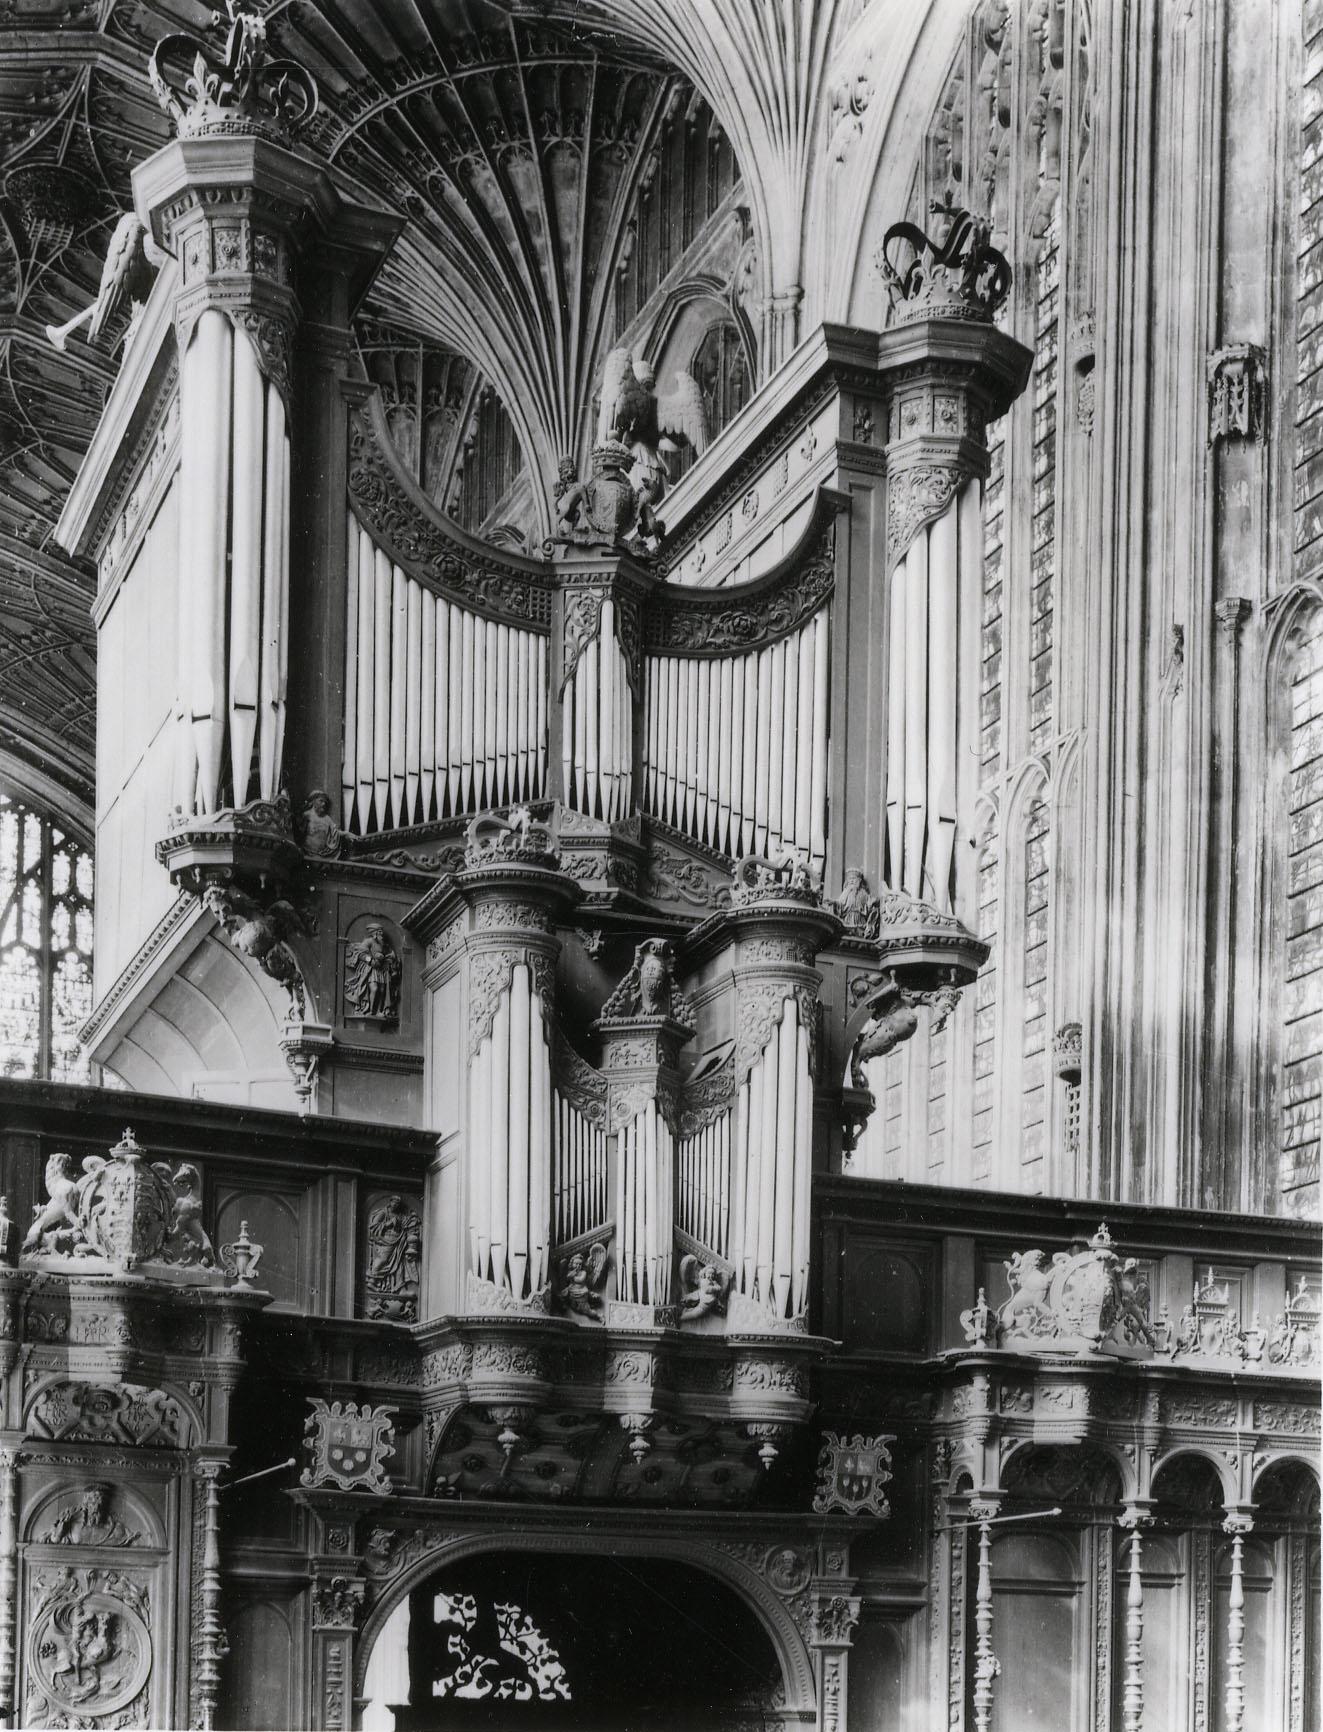 The organ case c. 1926, very like it was in 1911. (KCC/614)